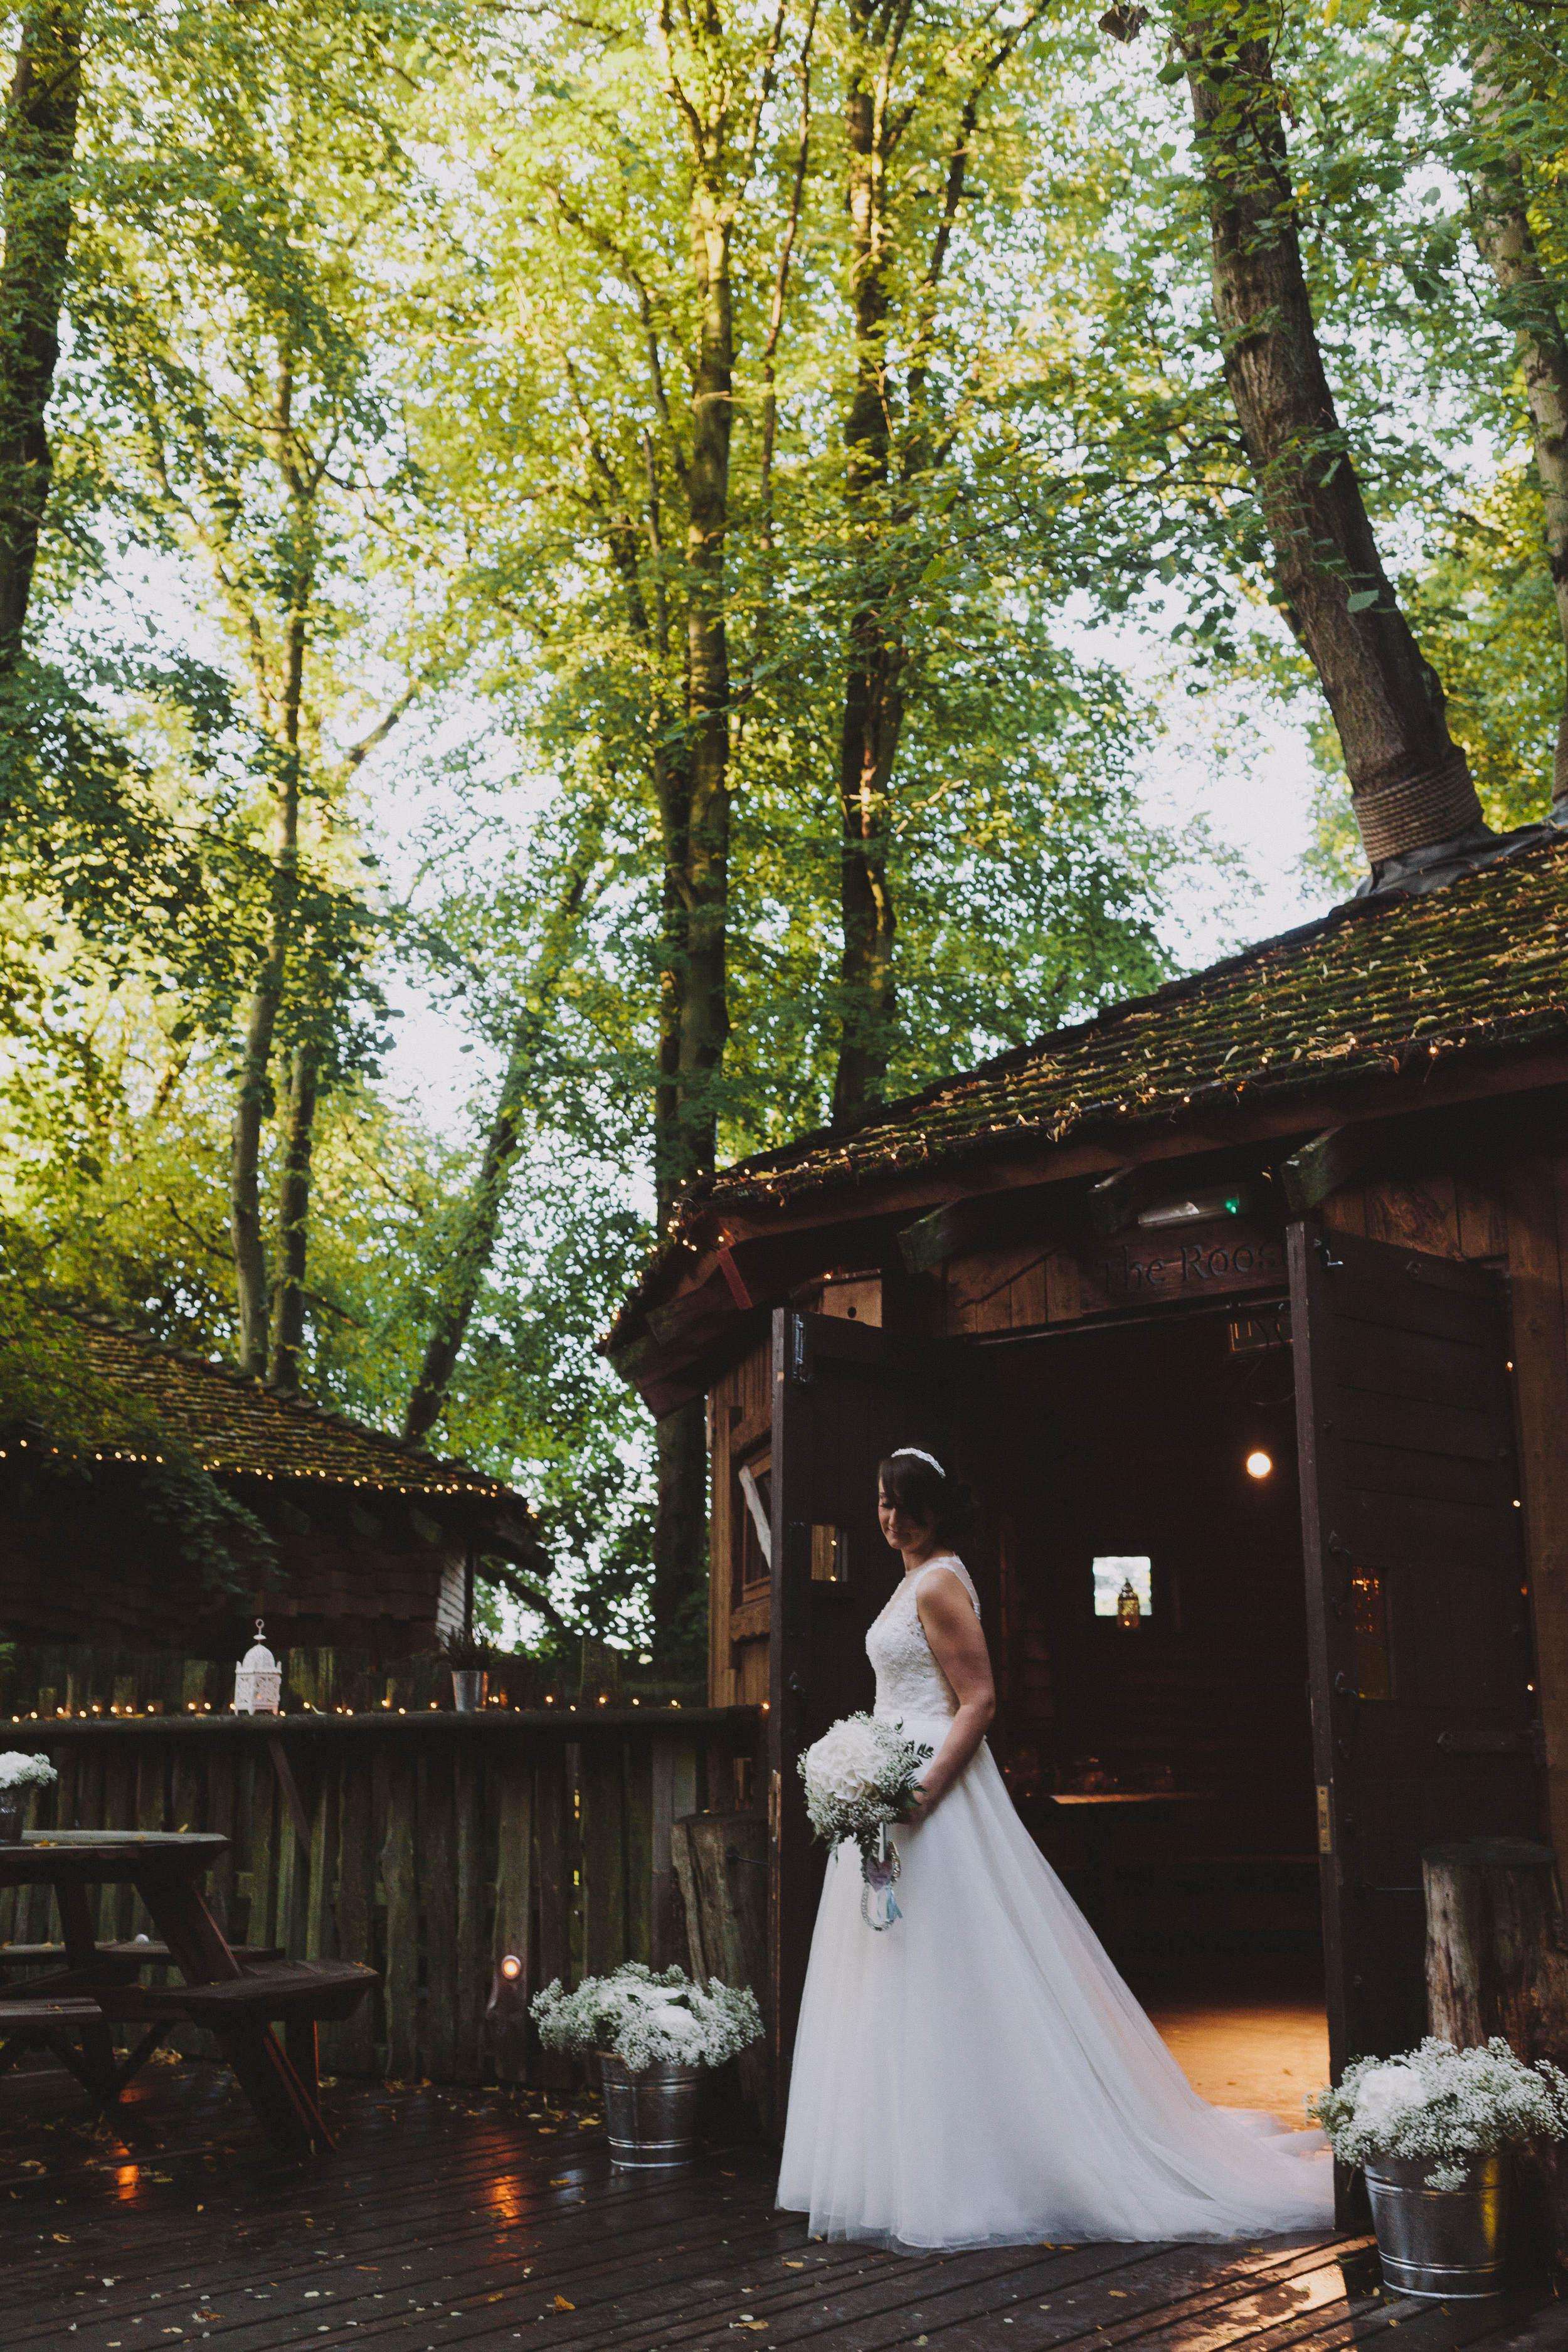 Alnwick Garden Treehouse Bride outside The Nest